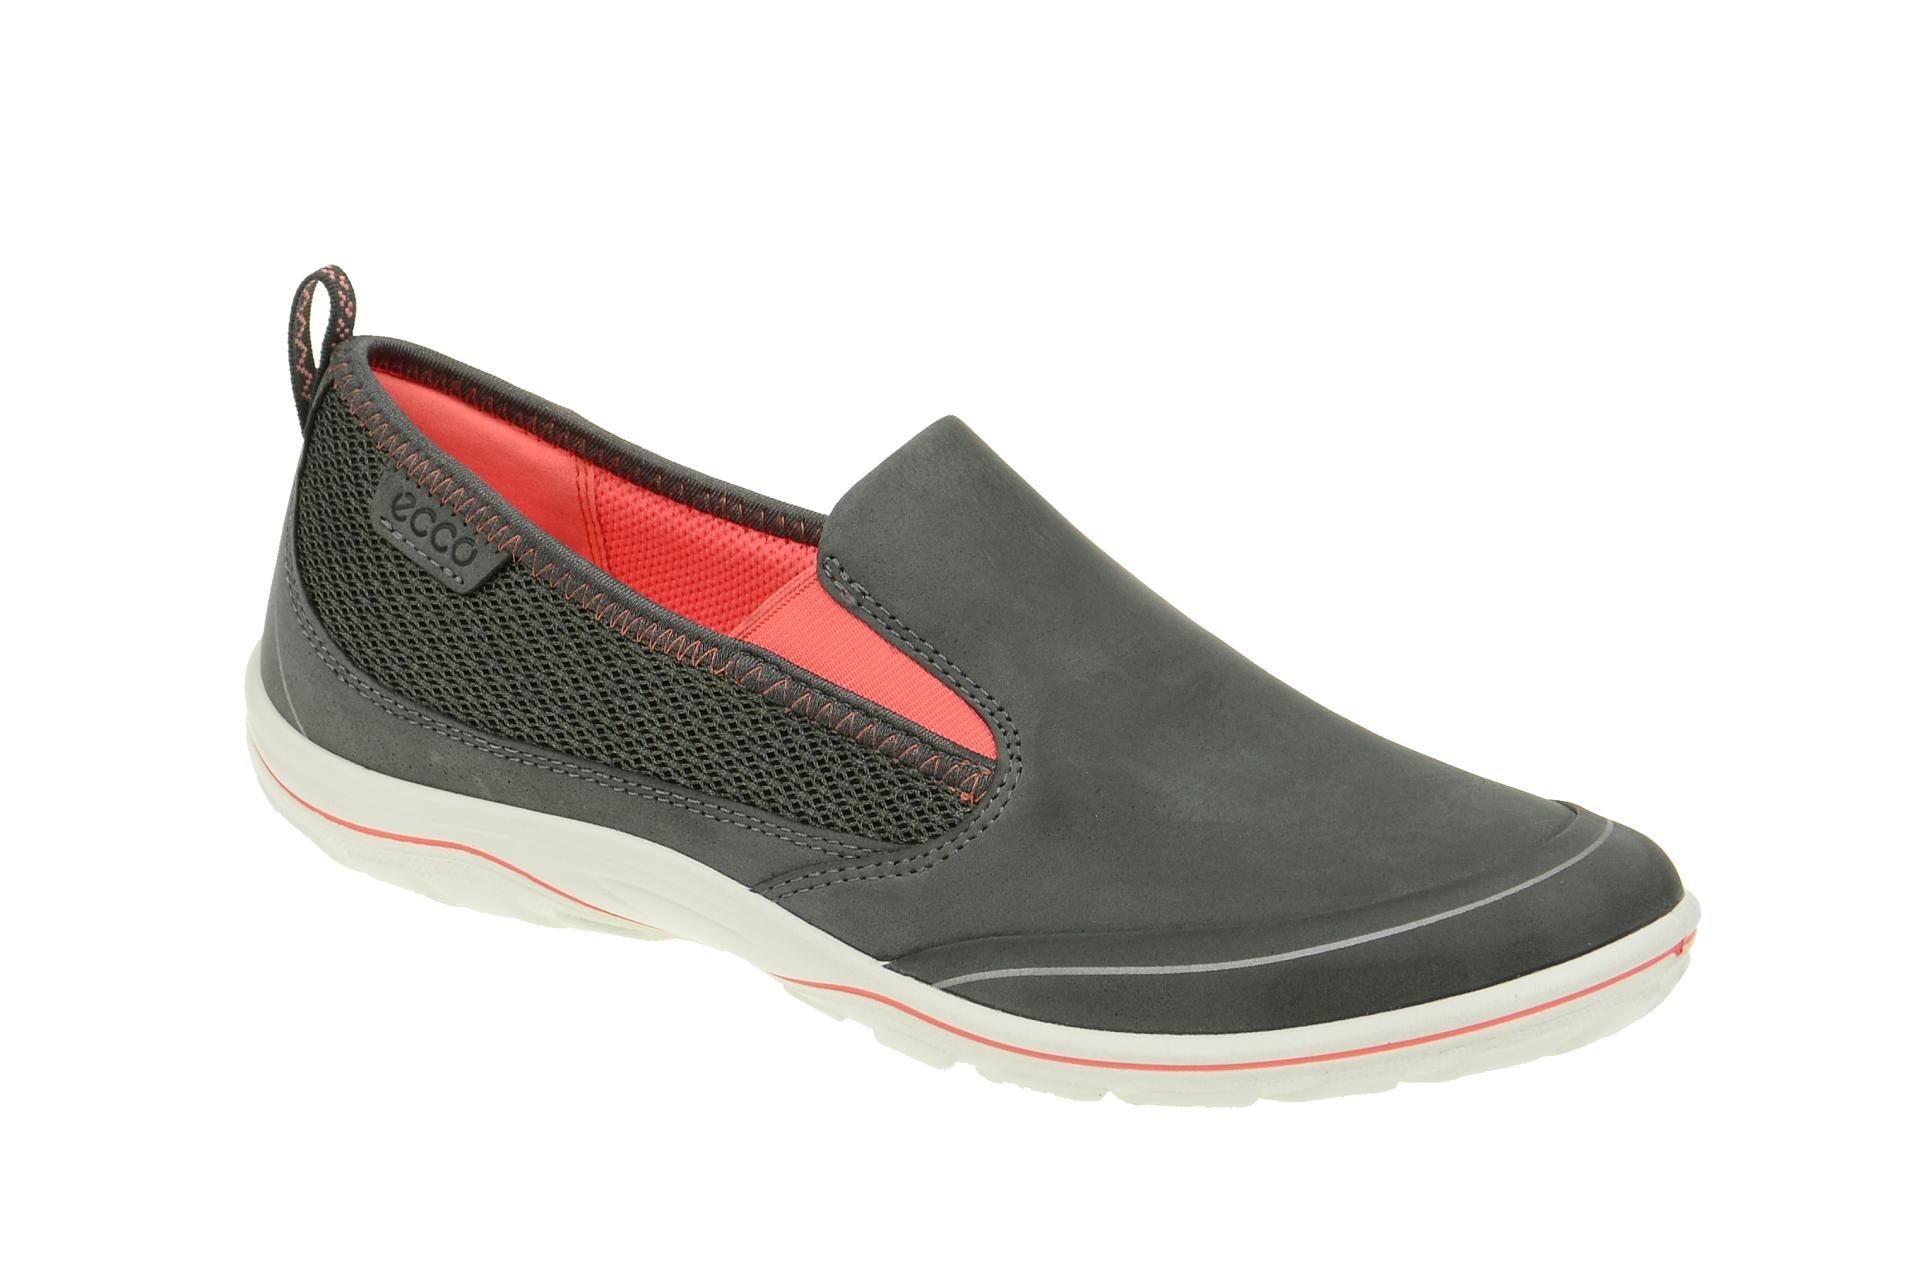 7c78f9f1423a87 Ecco Arizona Damen Slipper dunkel-grau - Schuhhaus Strauch Shop